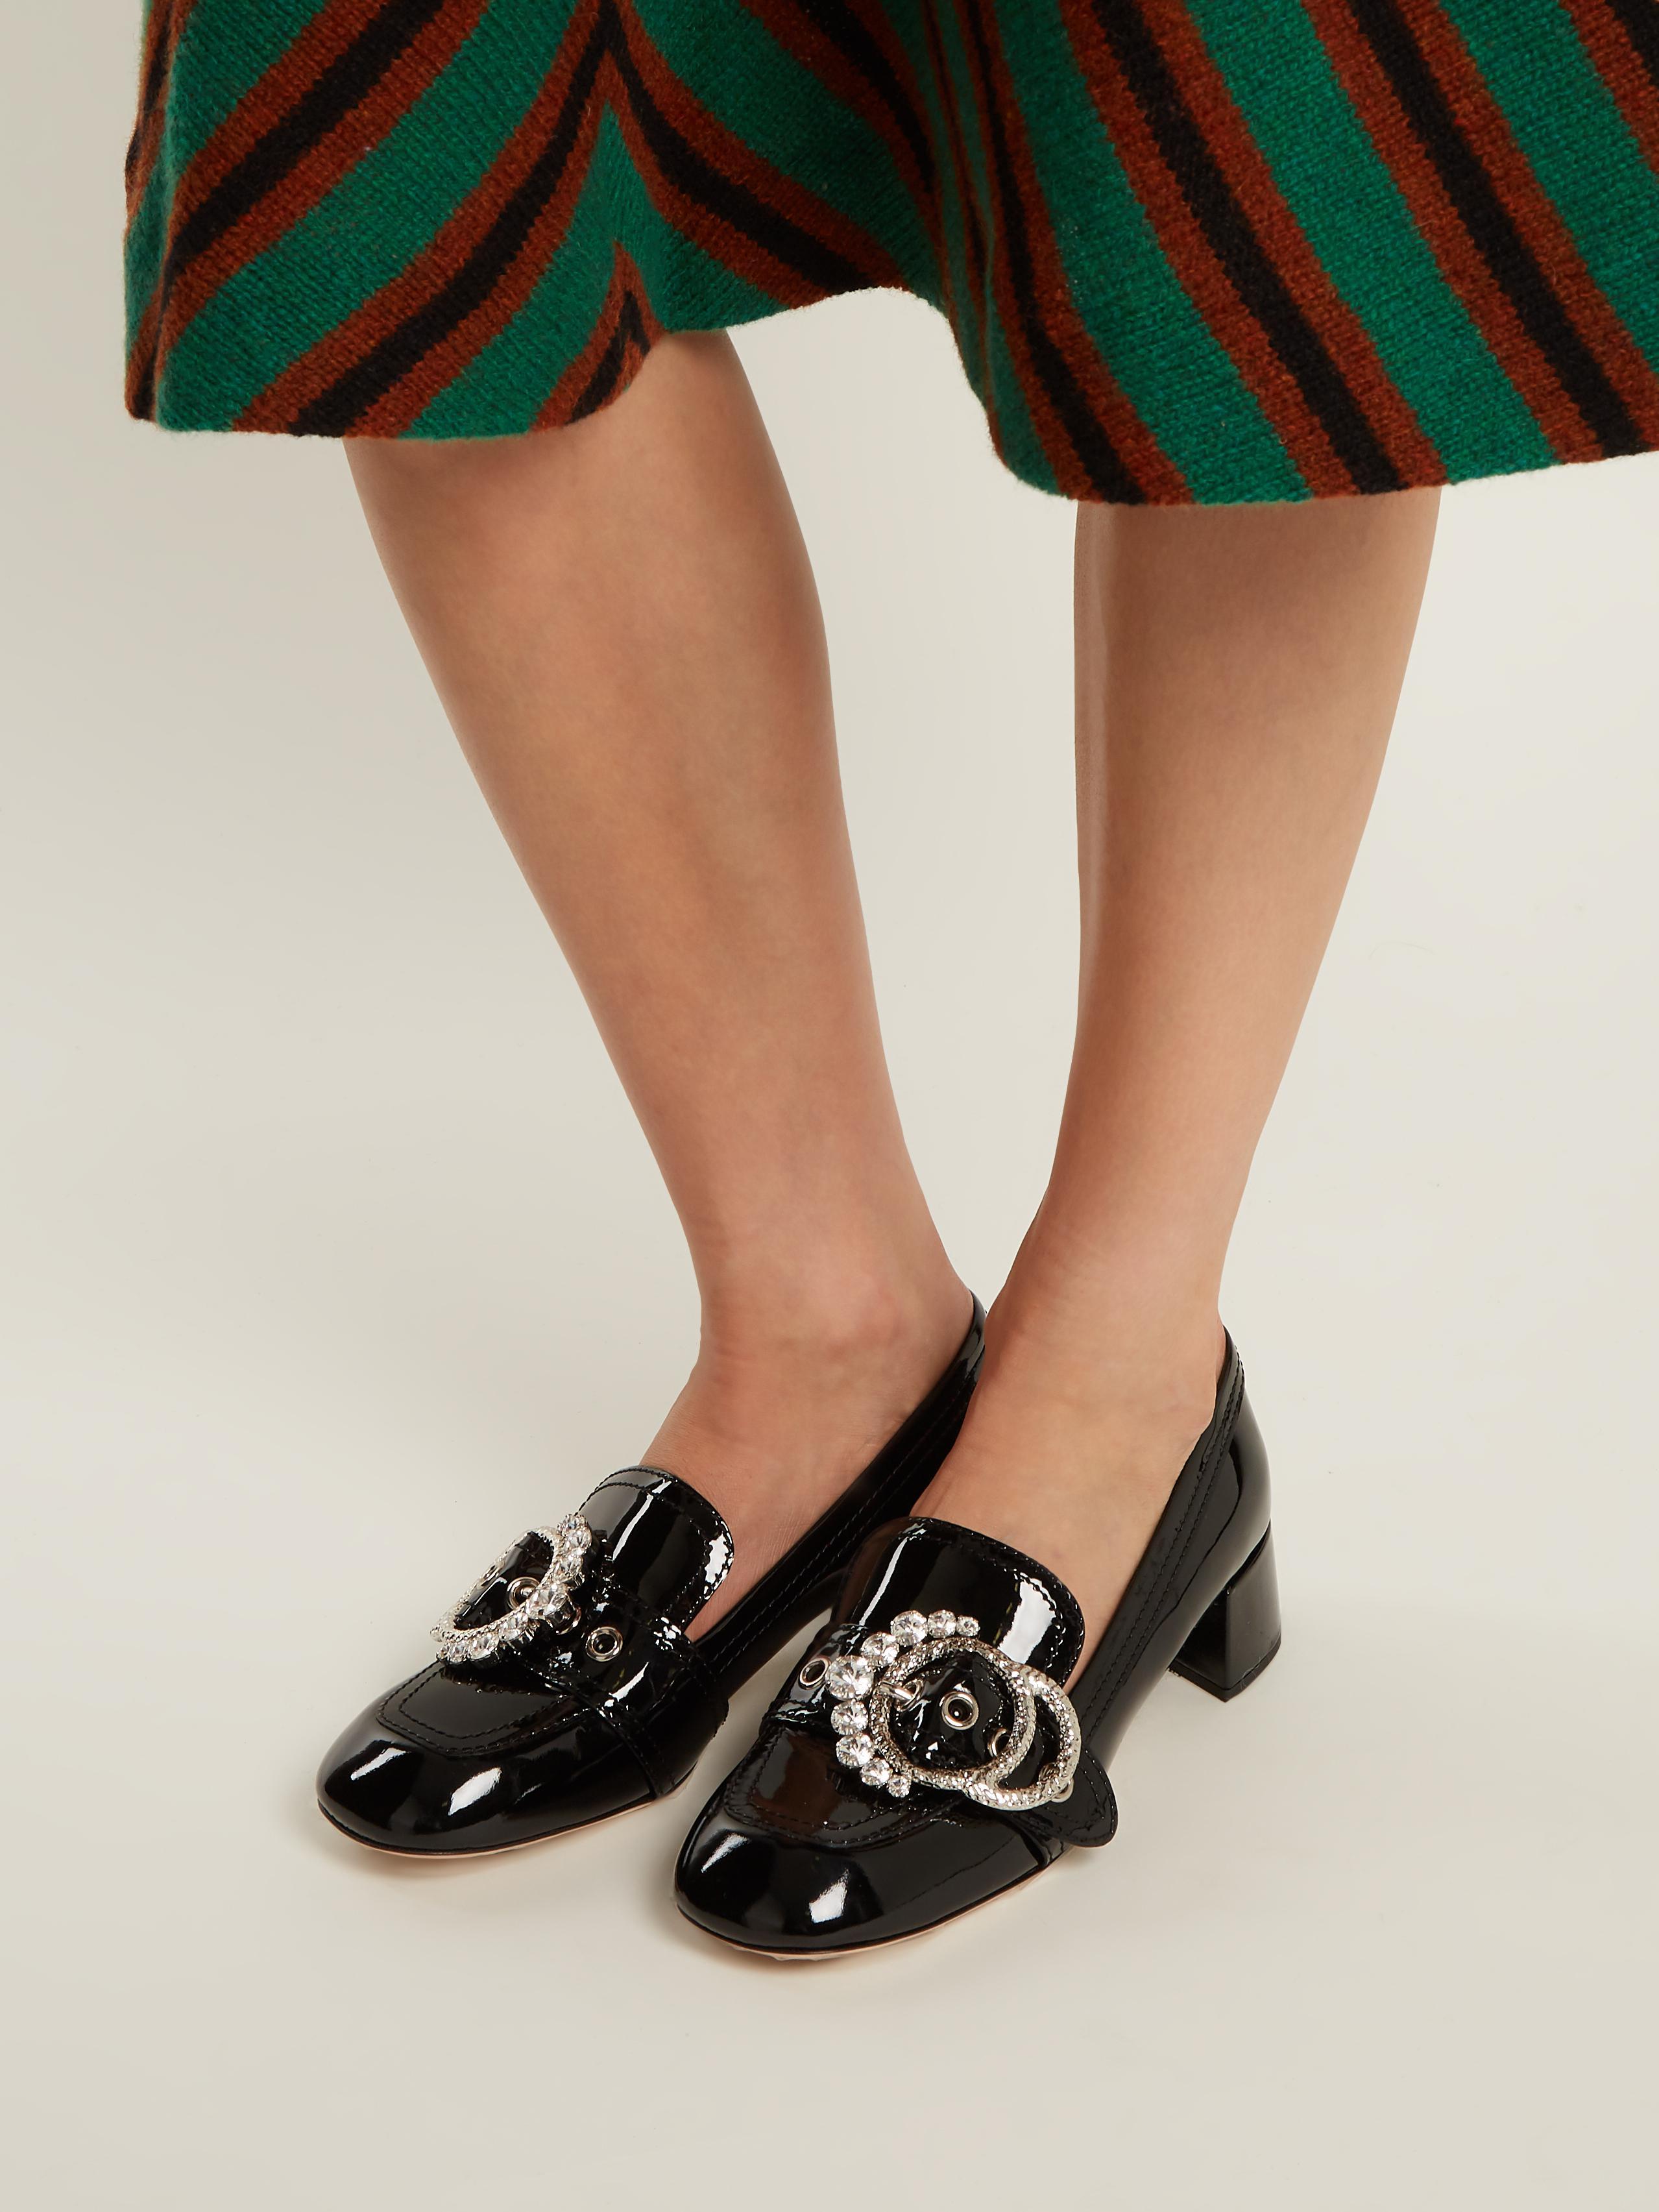 70ad428f8d0c7 Miu Miu Crystal-embellished Block- Heel Leather Loafers in Black - Lyst